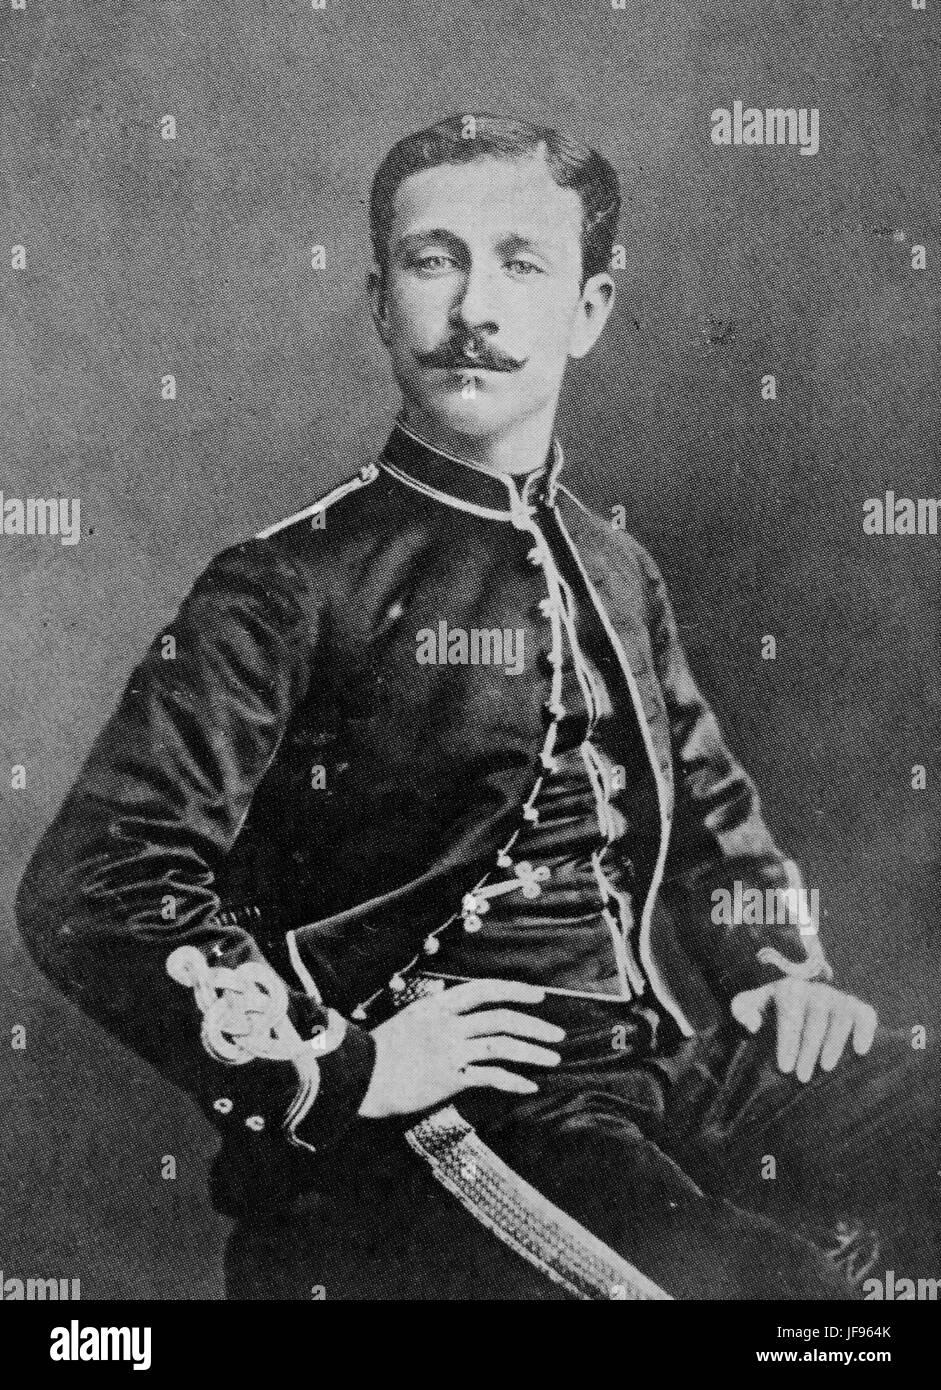 NAPOLEON, Prince Imperial (1856-1879) son of Napoleon II and Eugenie. - Stock Image